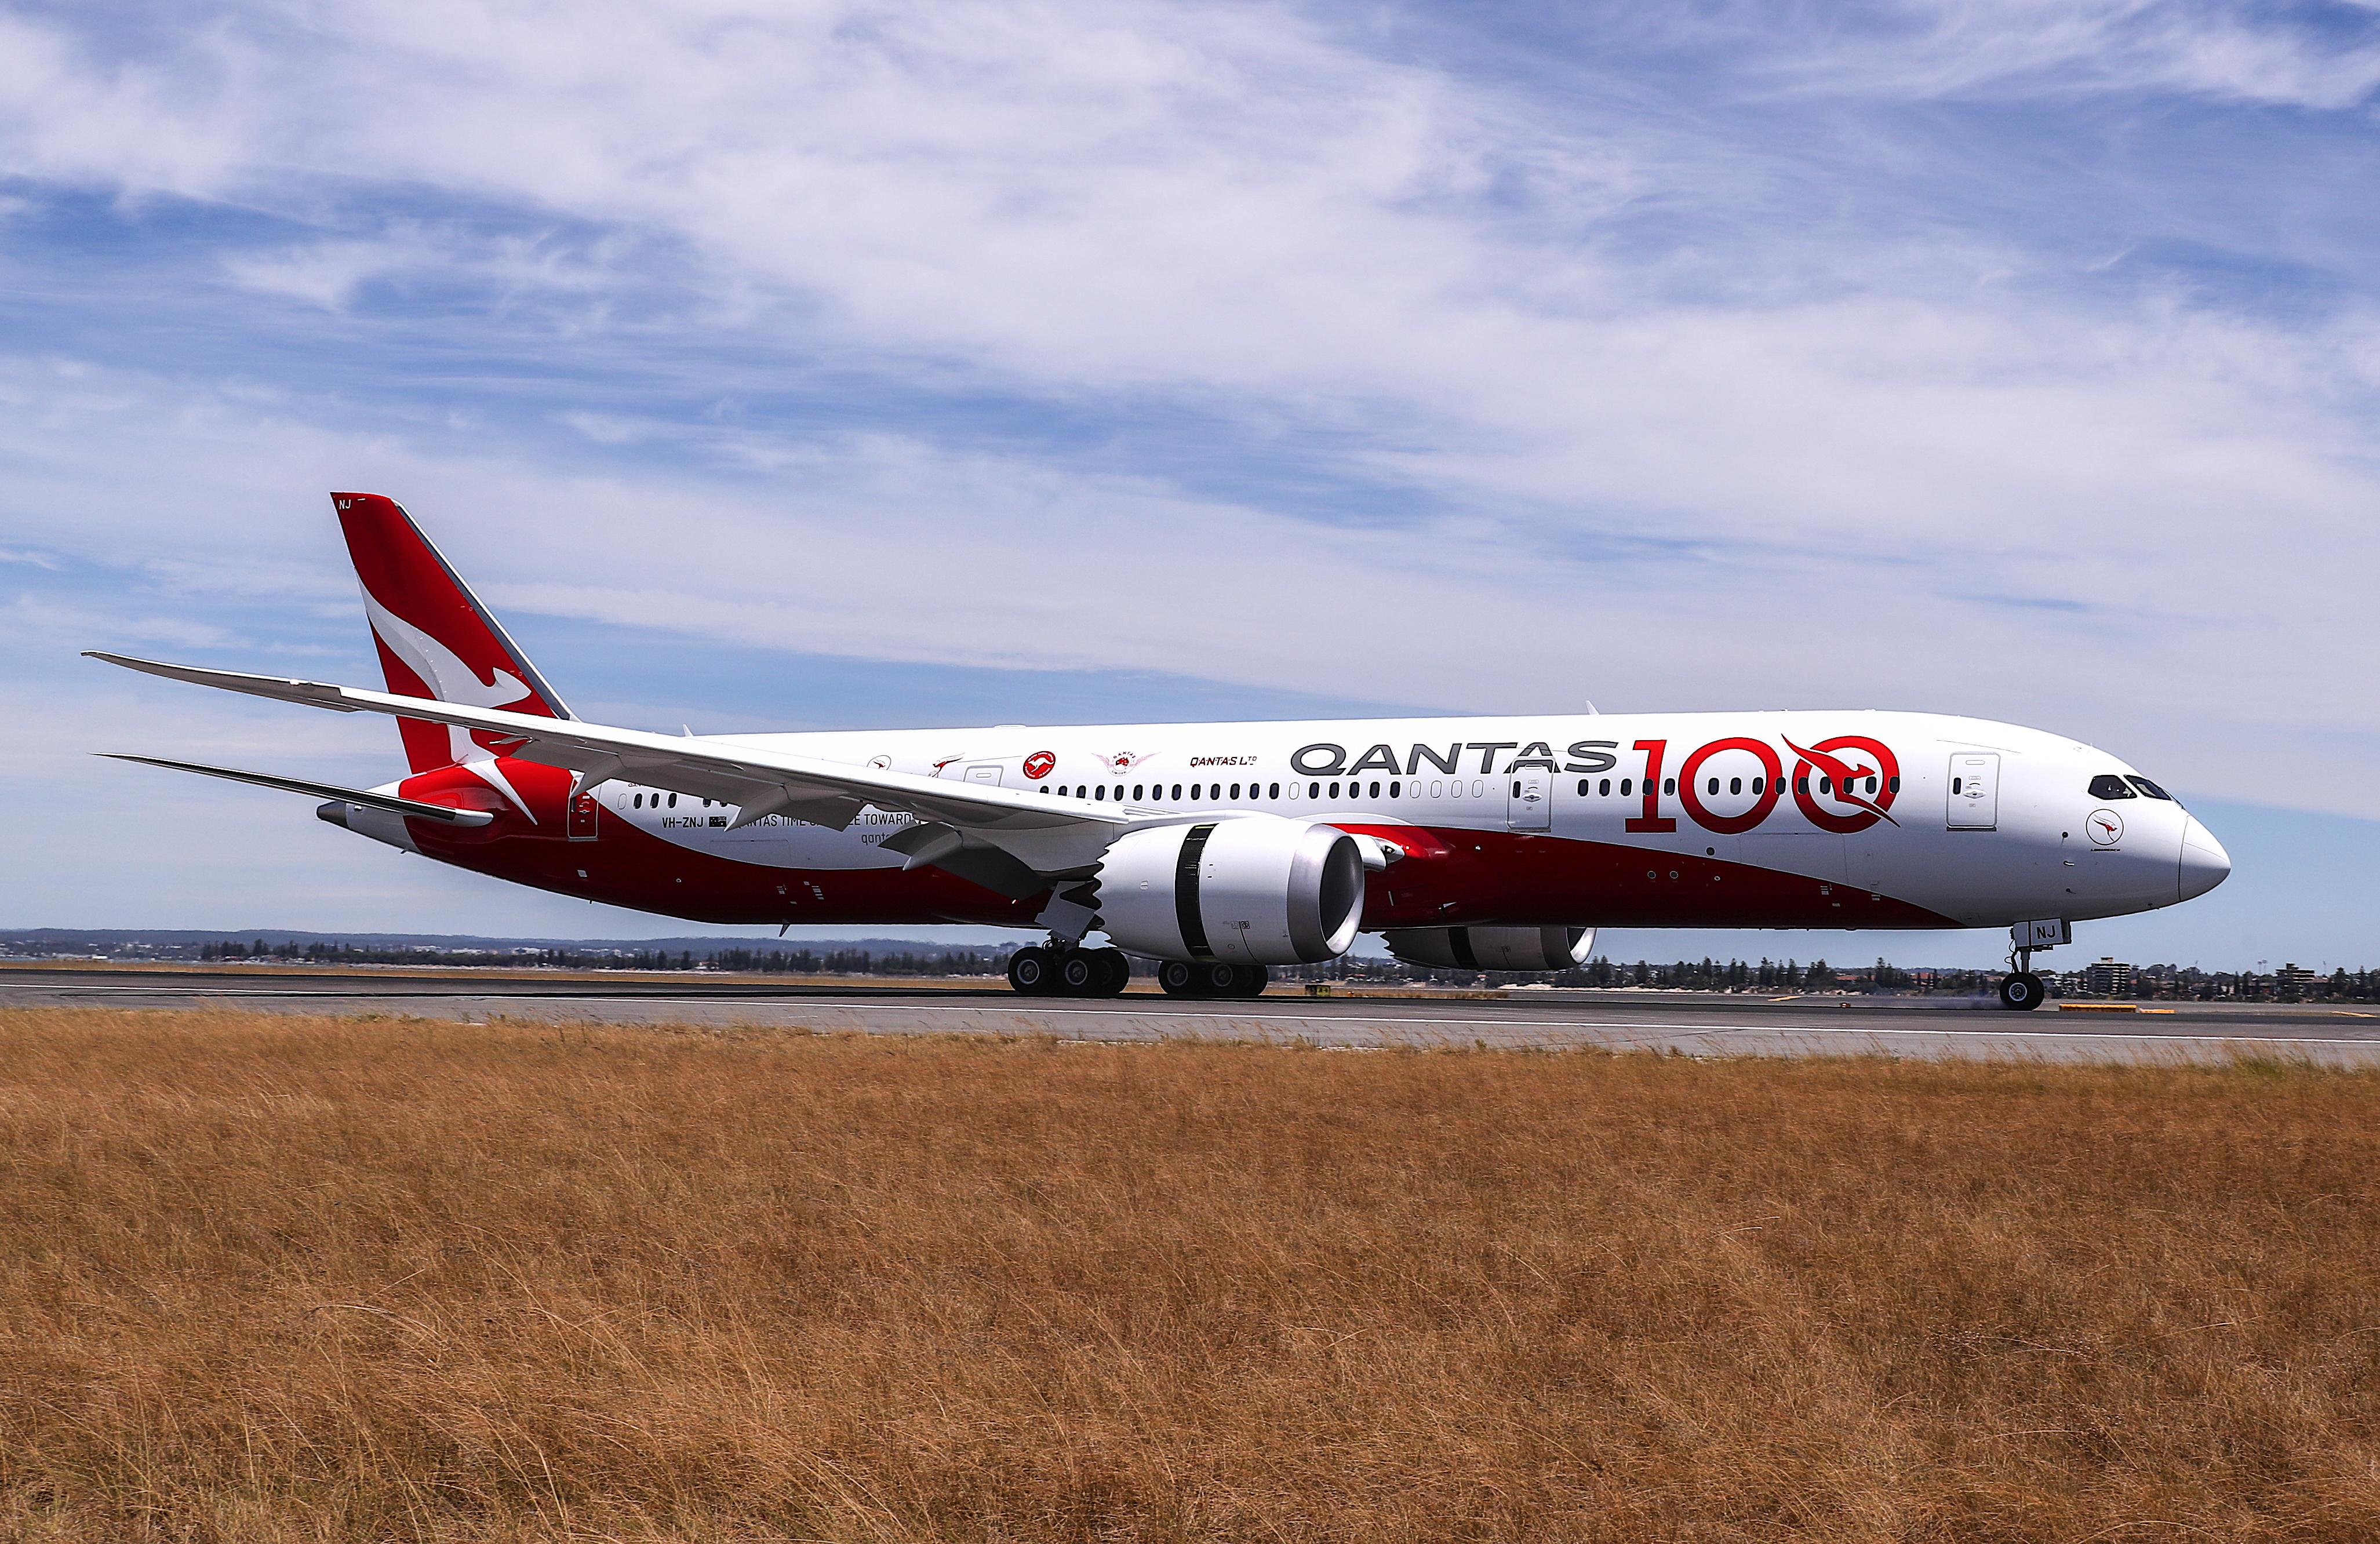 Qantas pilots go above union to prevent Project Sunrise take-off